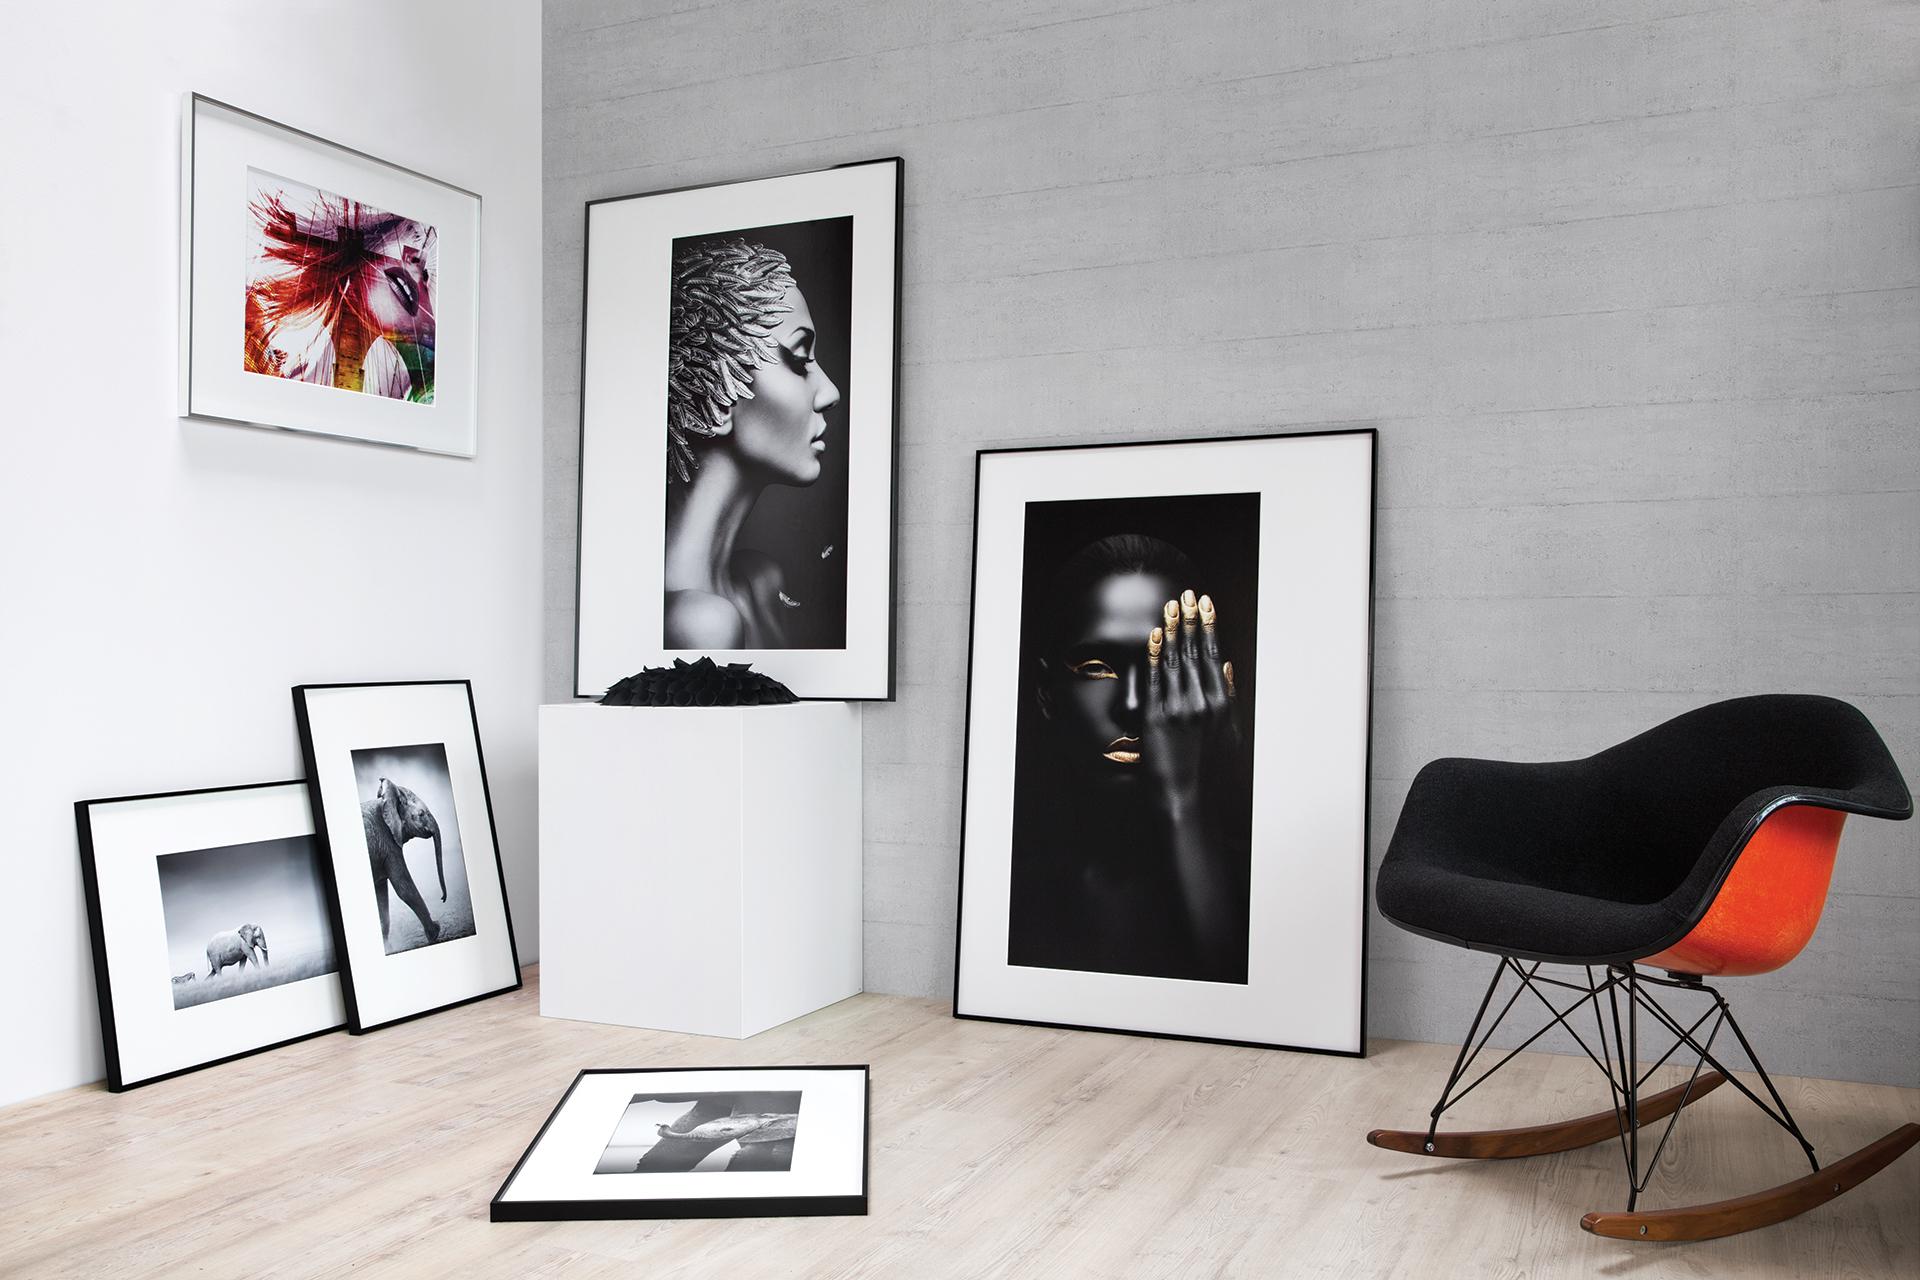 alpha aluminium bilderrahmen produkte nielsen. Black Bedroom Furniture Sets. Home Design Ideas